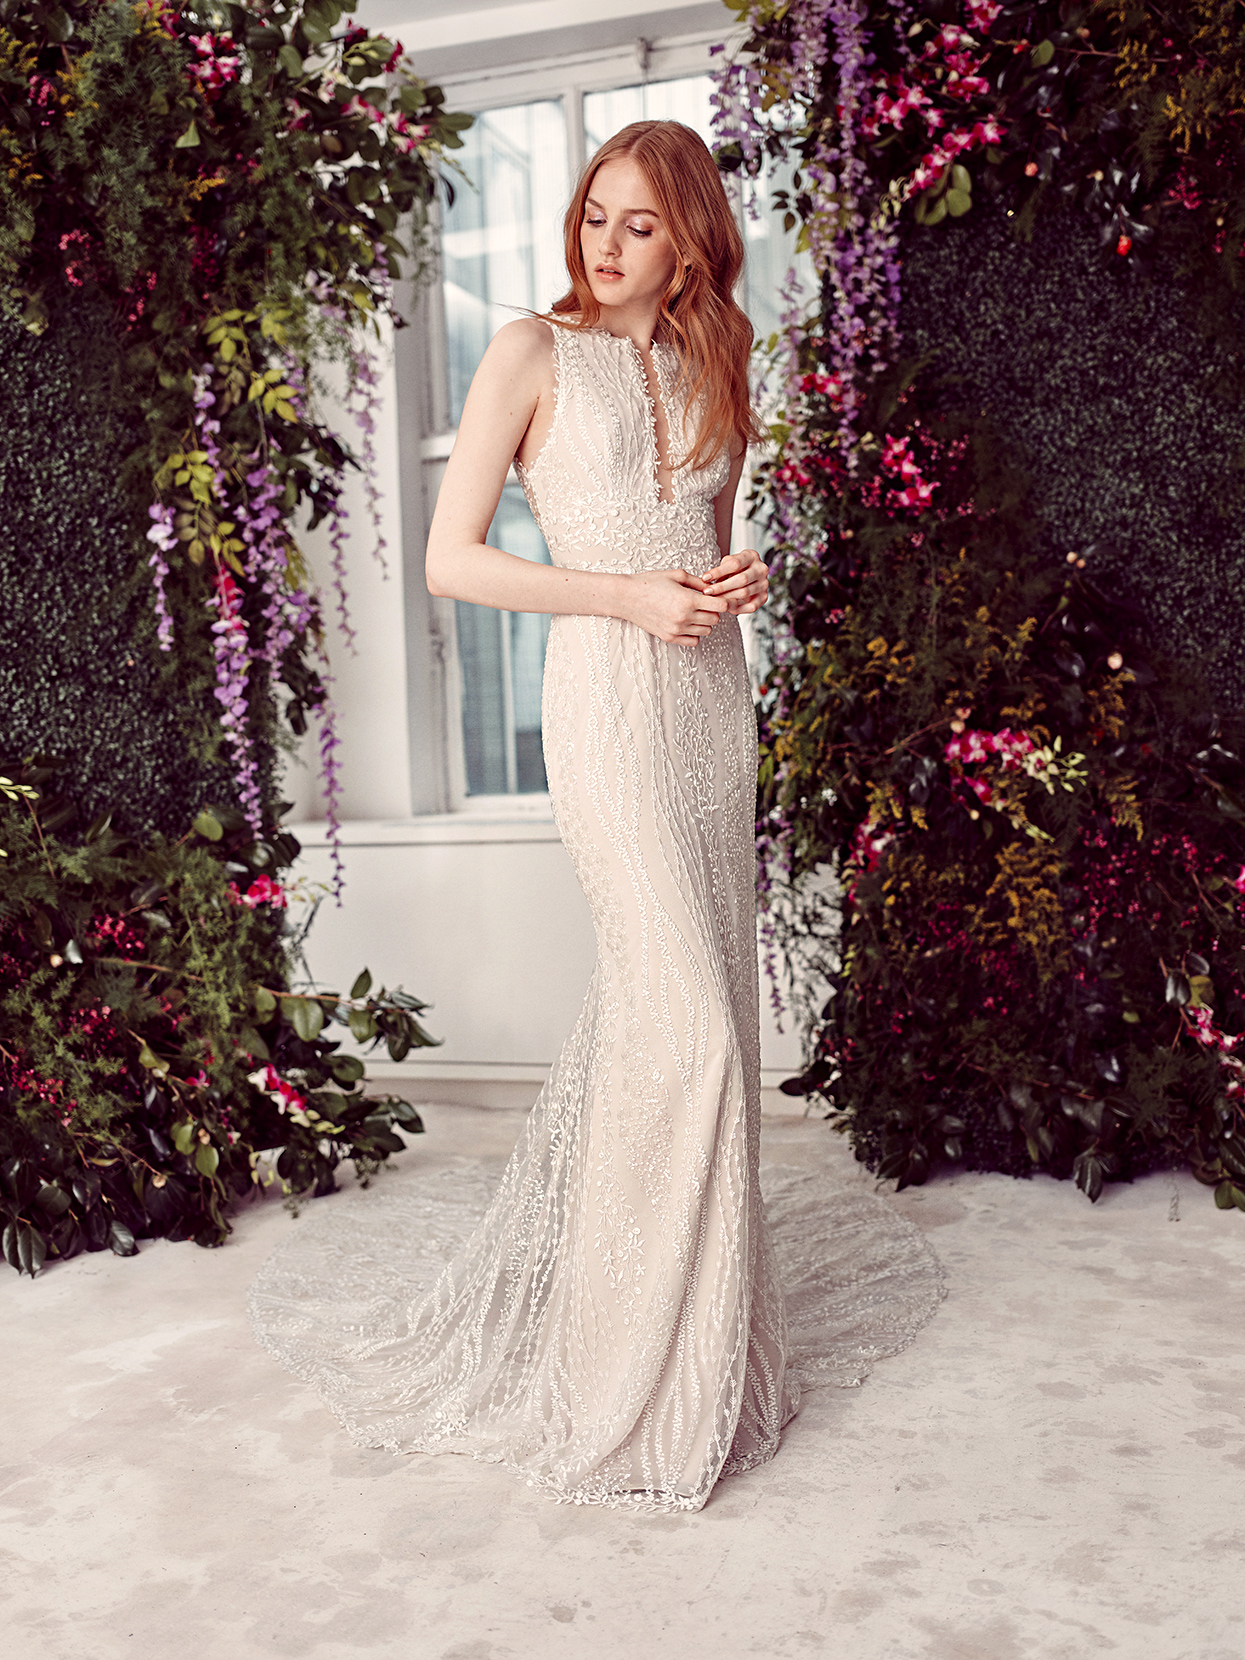 alyne by rita vinieris champagne beaded high-neck wedding dress spring 2020